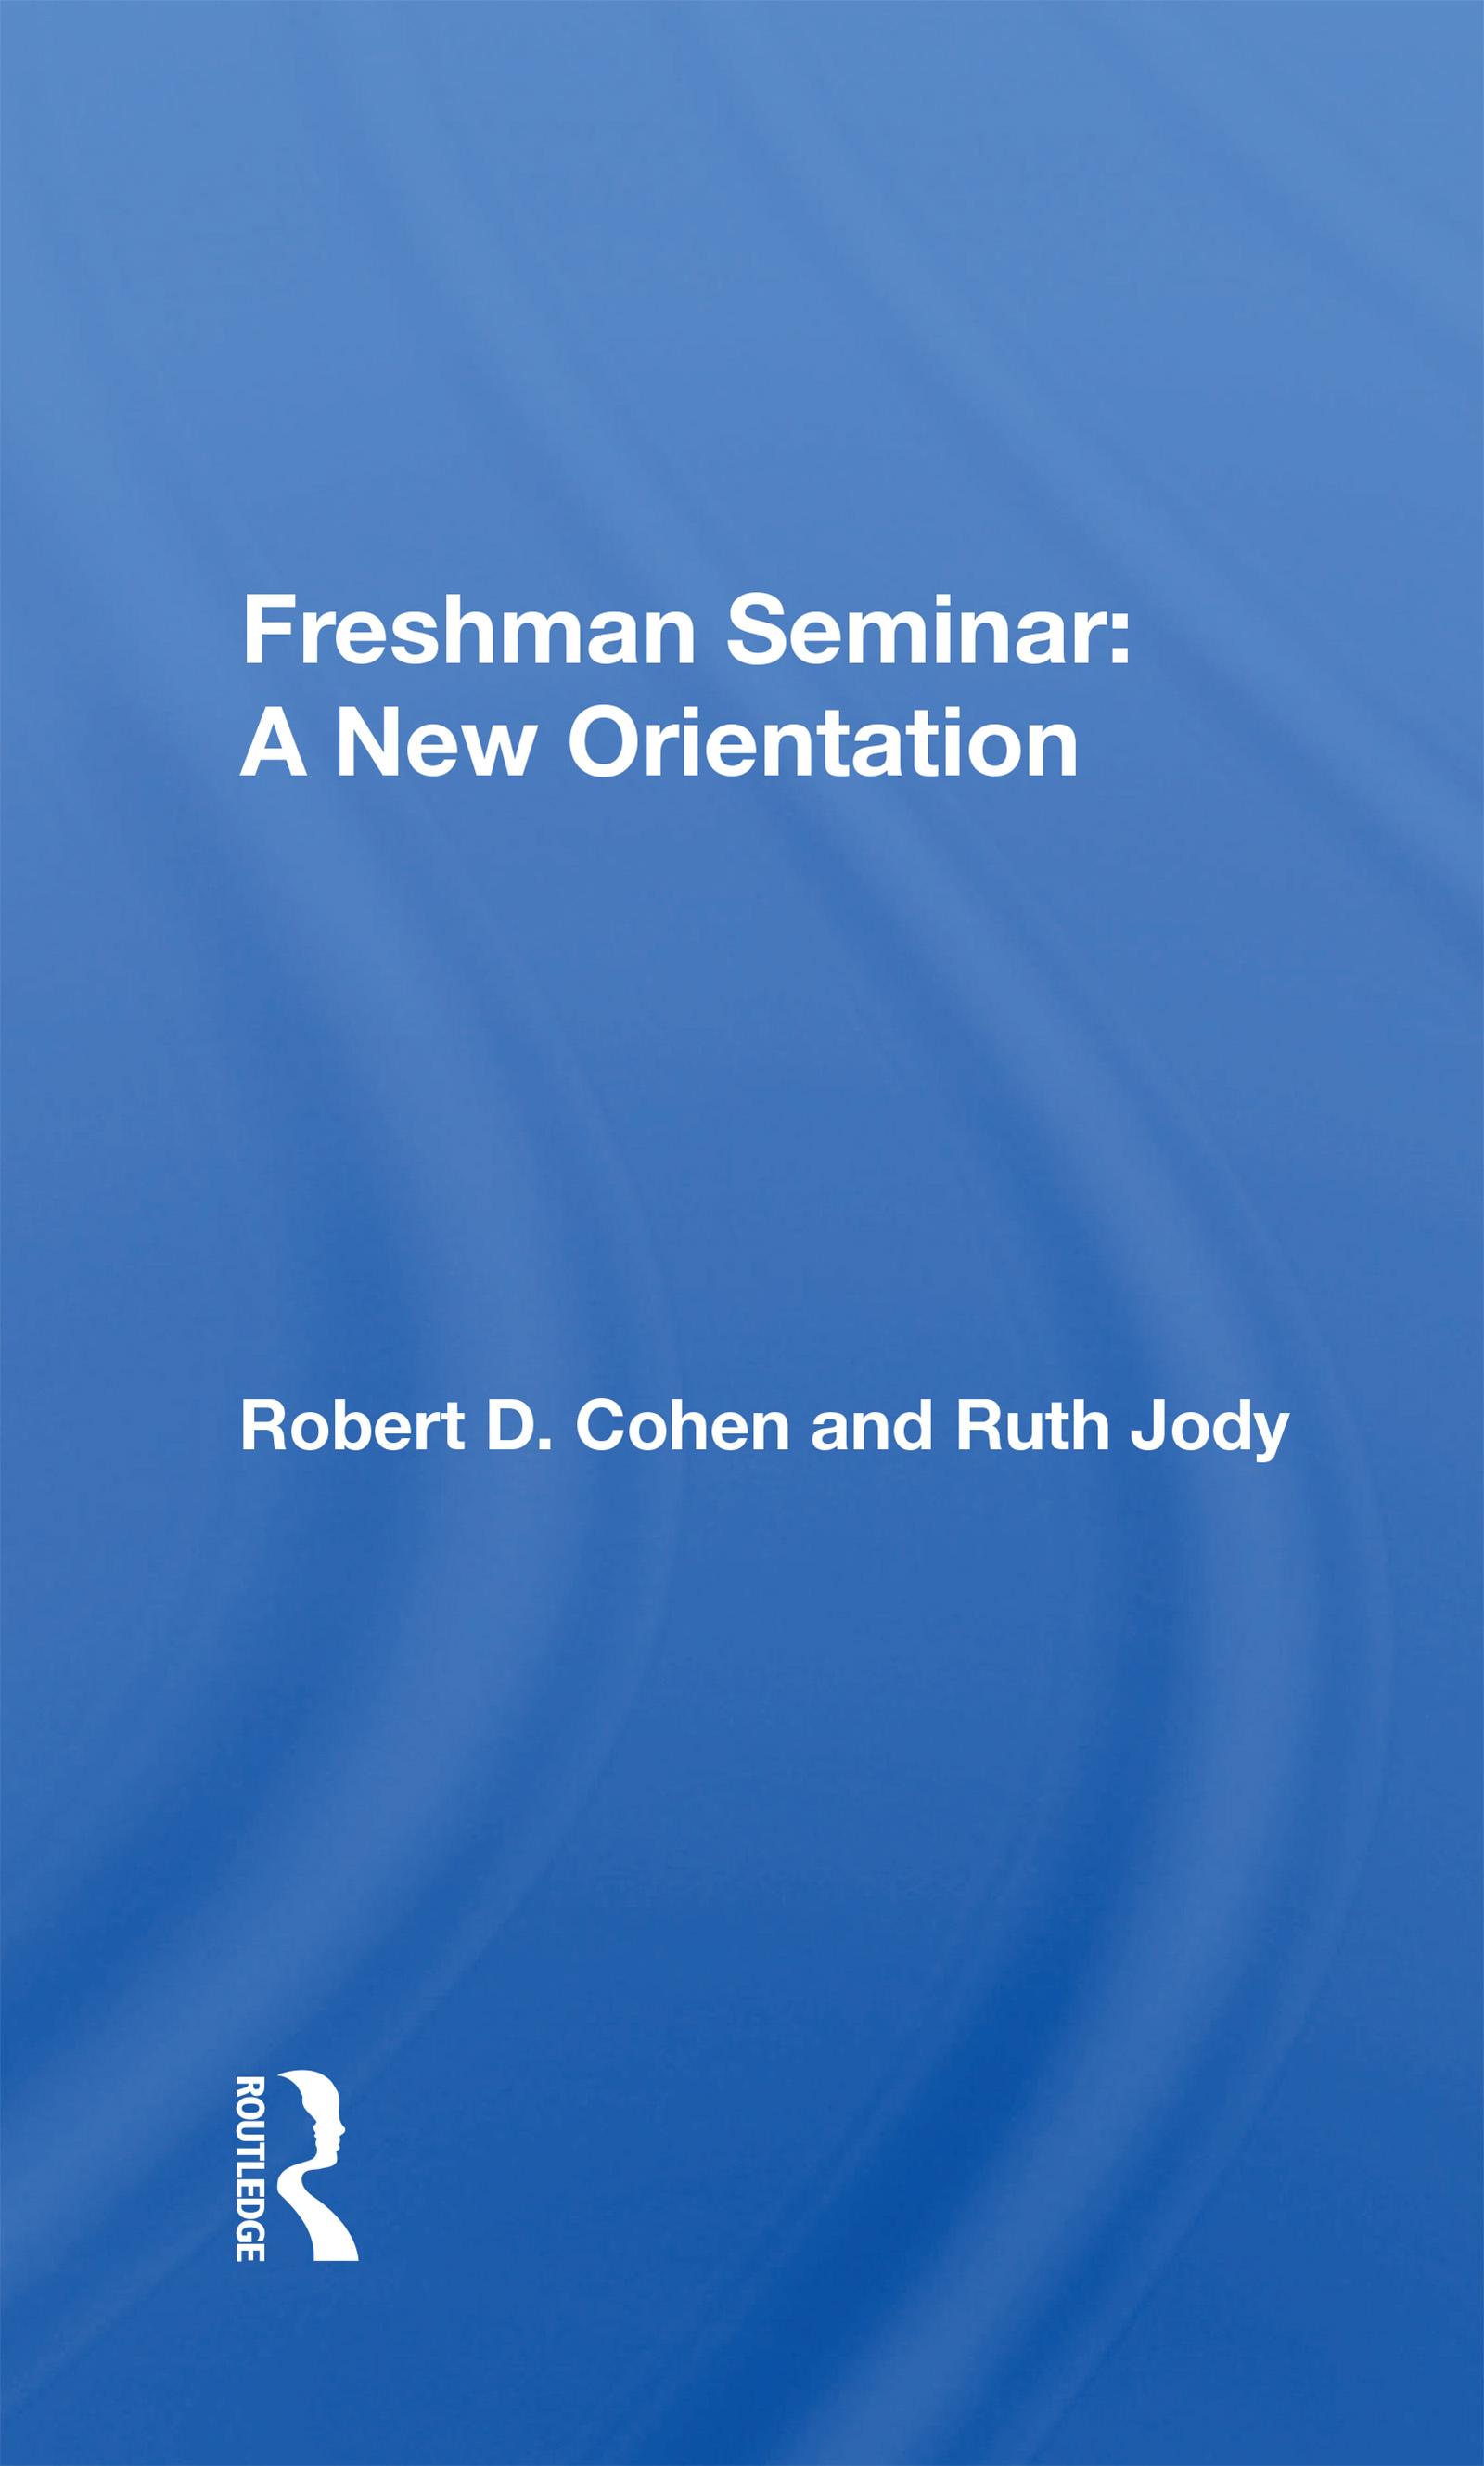 Freshman Seminar: A New Orientation book cover